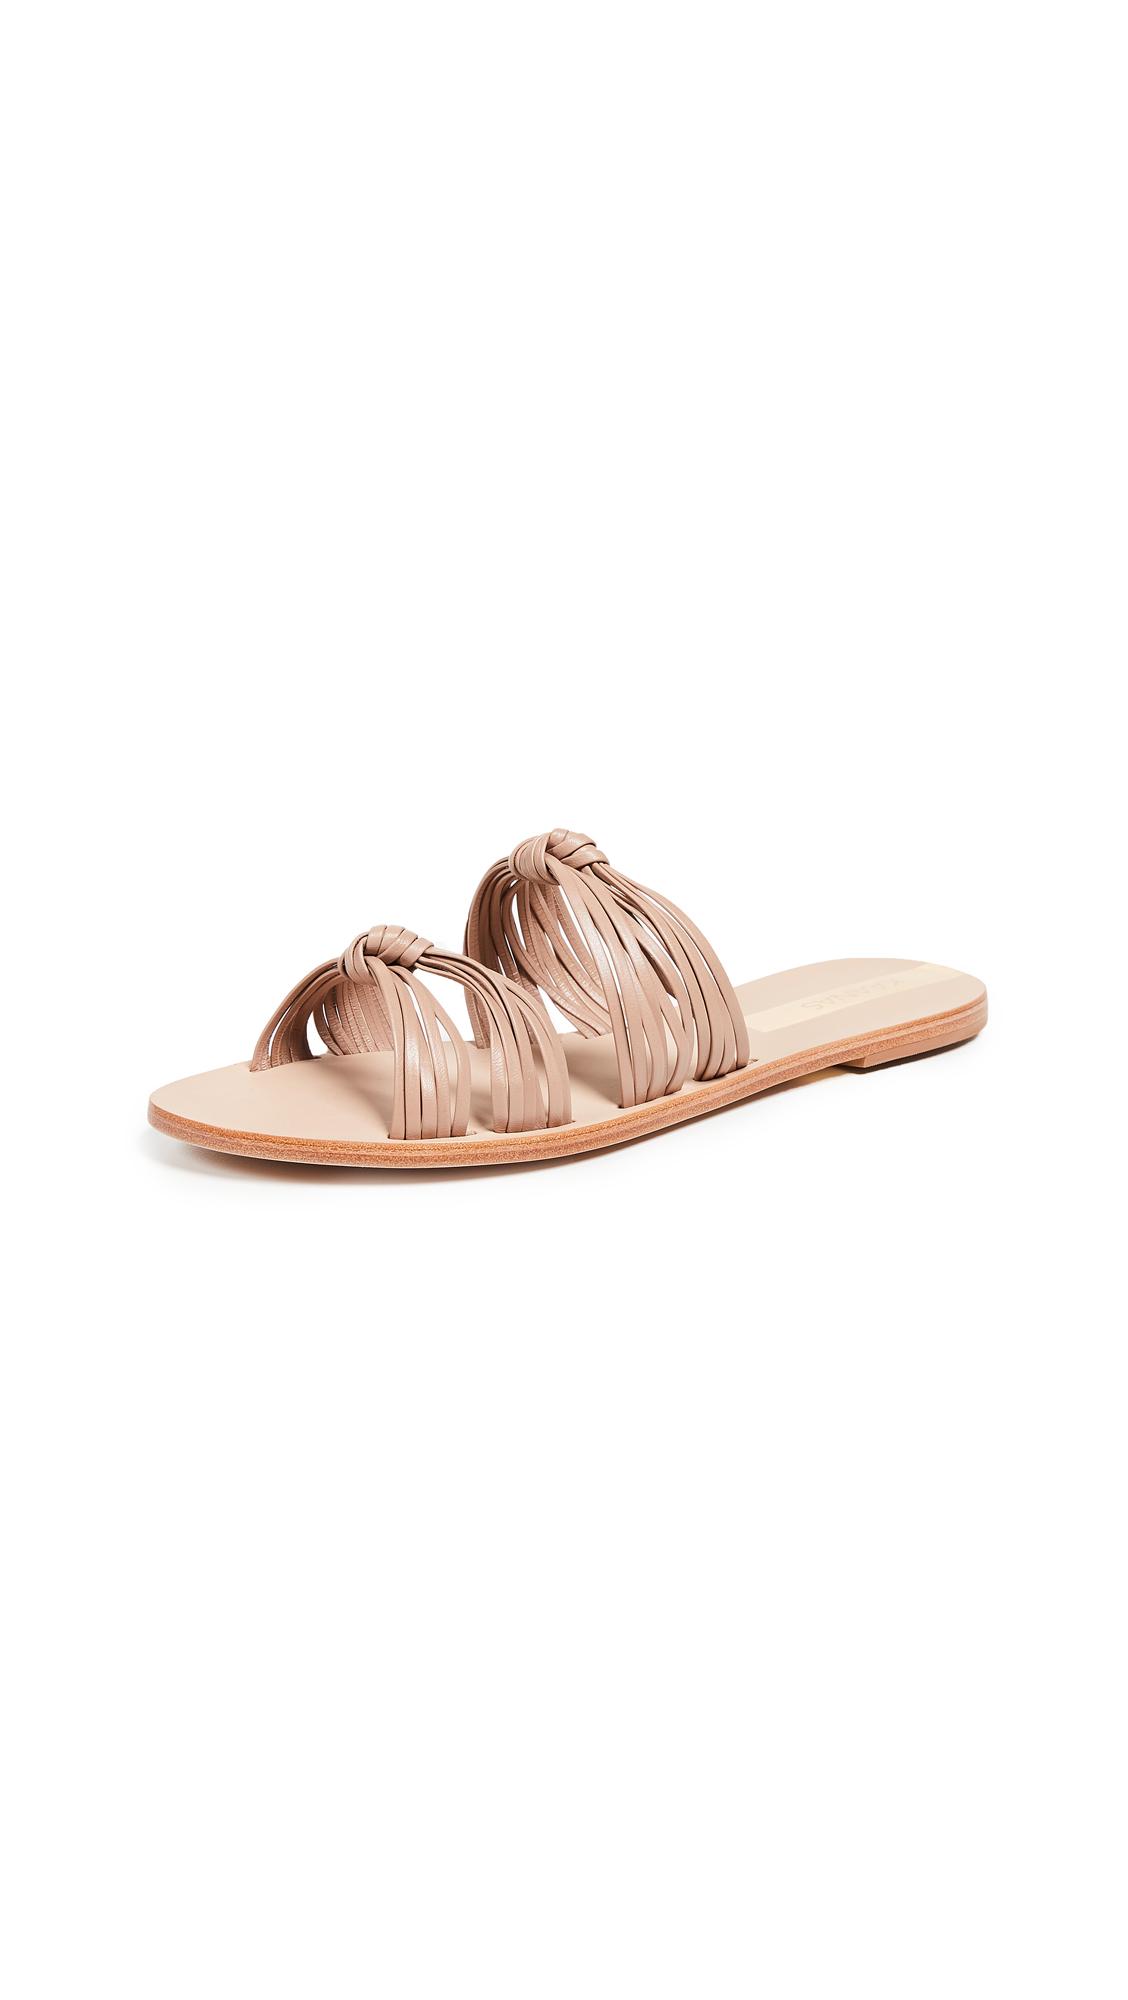 KAANAS Iguazu Multi Strap Sandals - Nude